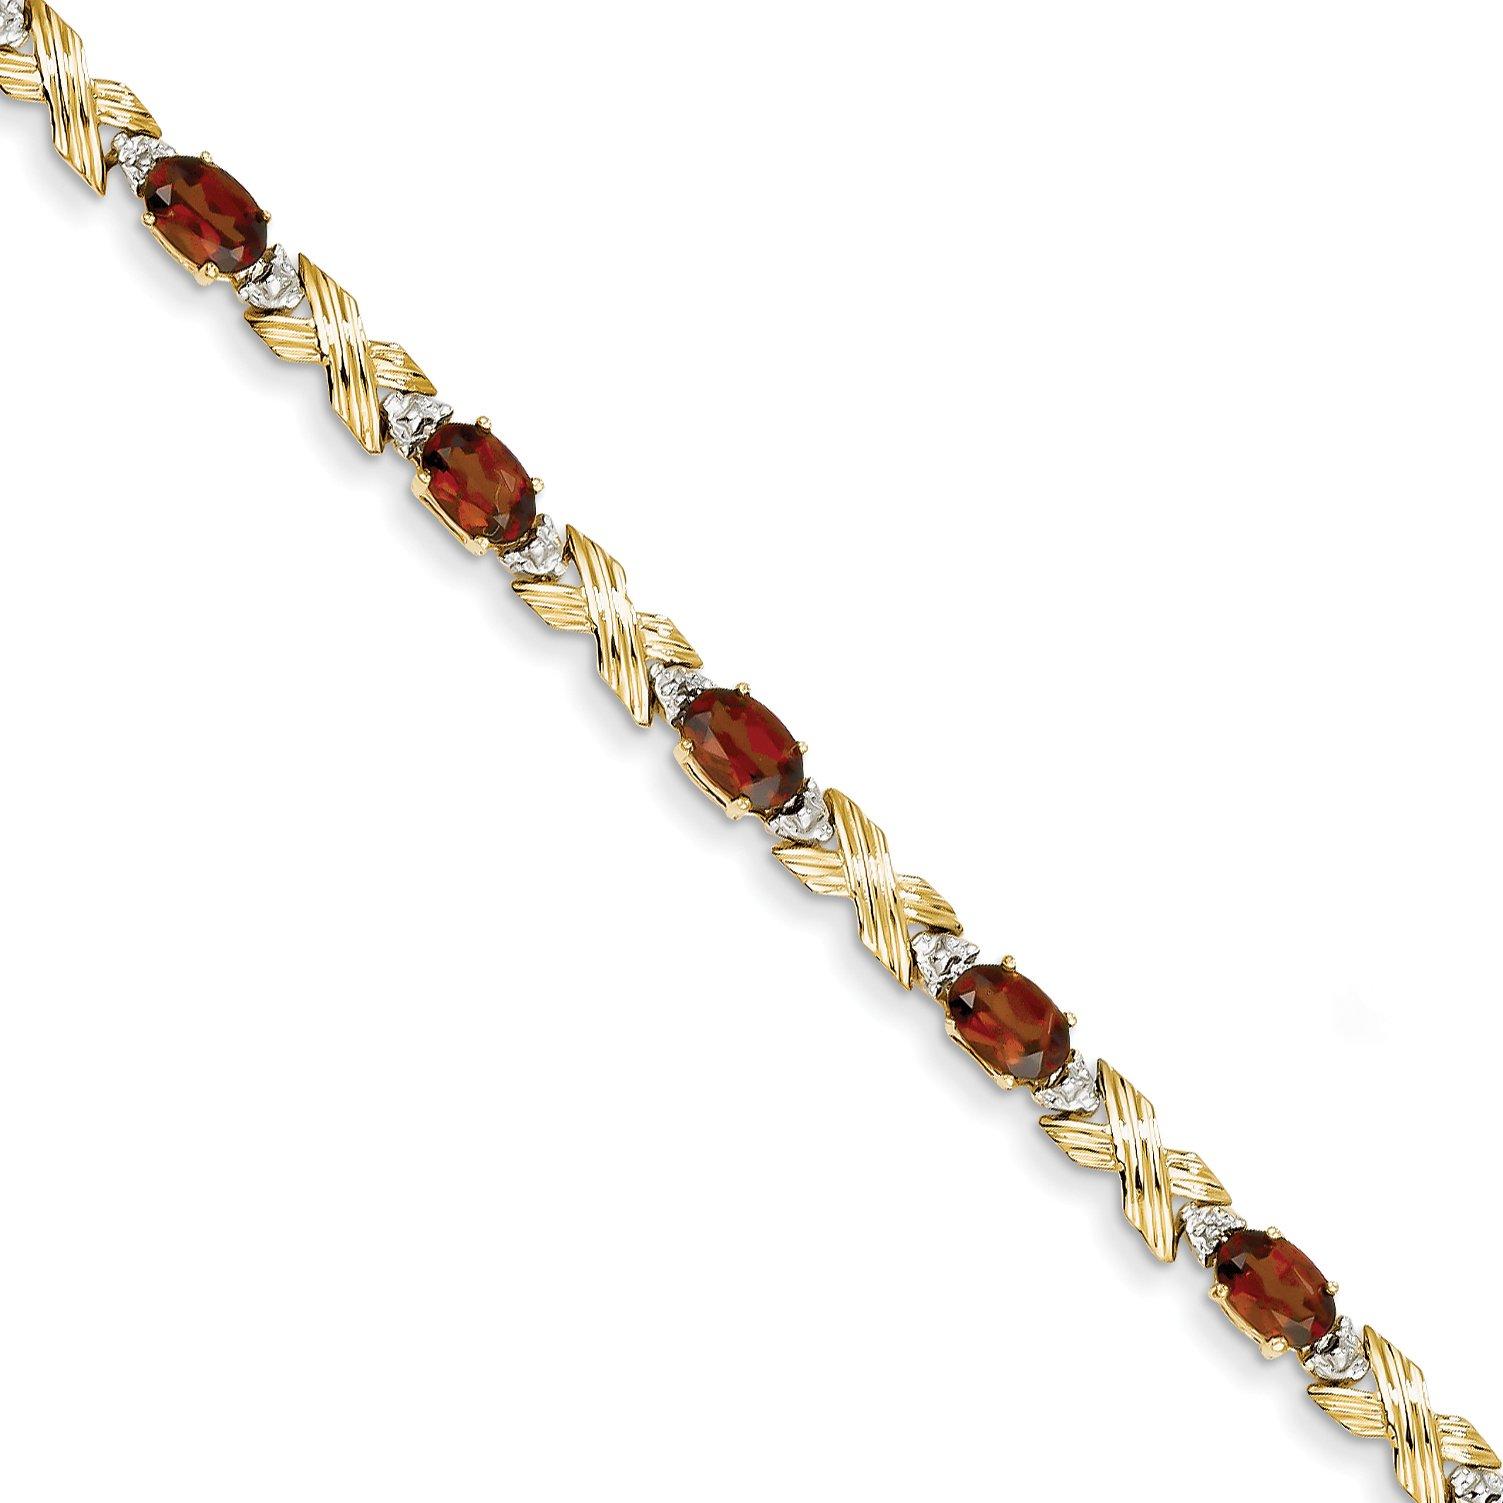 ICE CARATS 14k Yellow Gold Red Garnet Diamond Bracelet 7 Inch Gemstone Fine Jewelry Gift Set For Women Heart